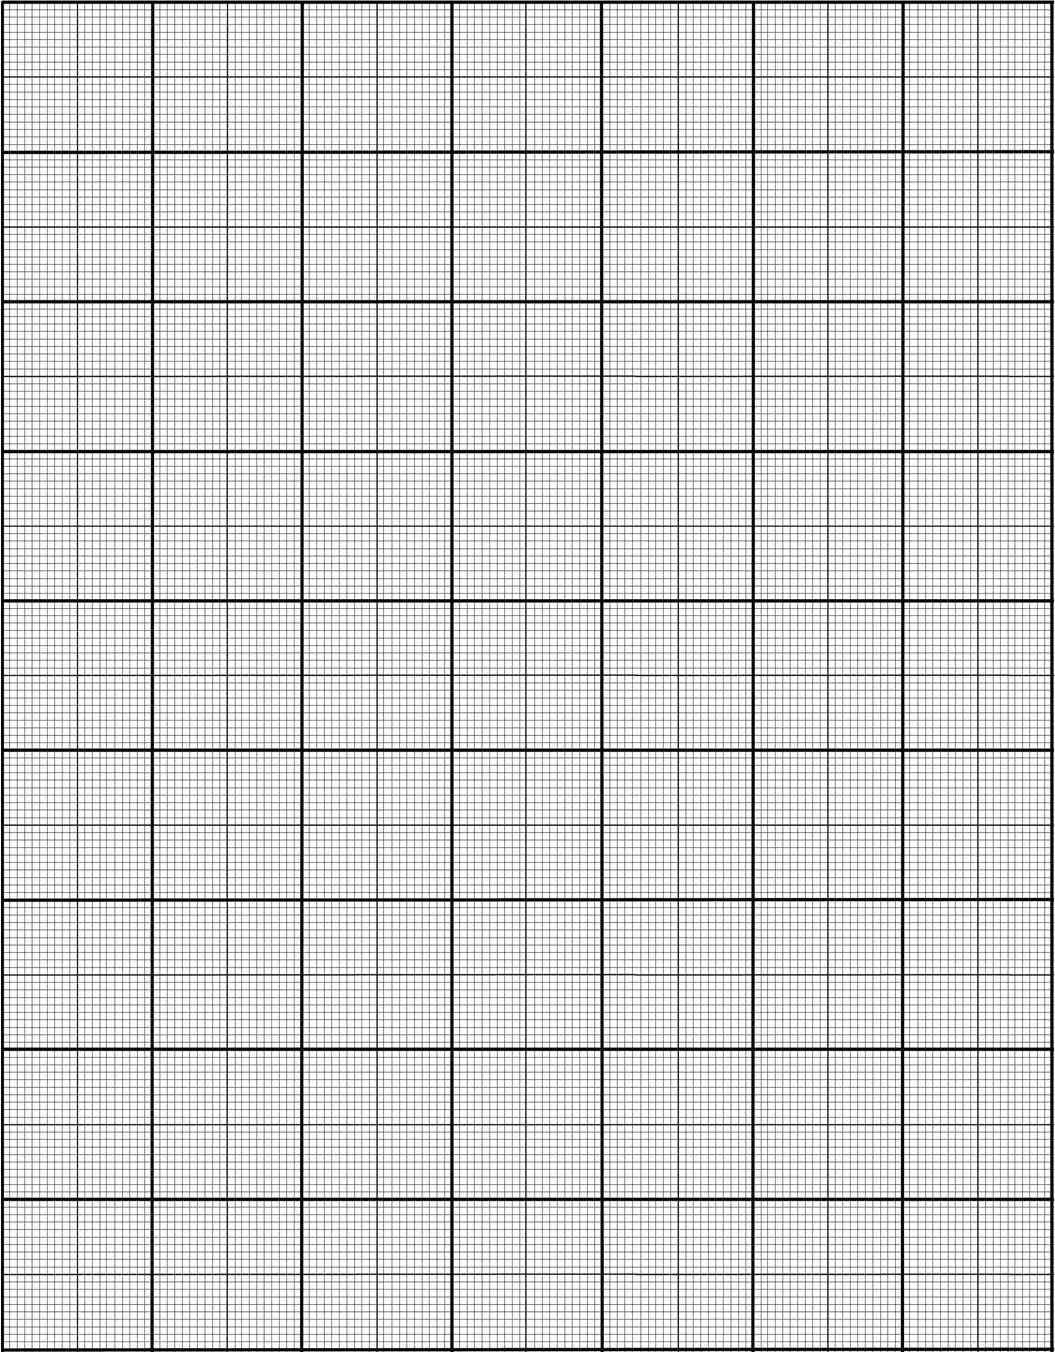 Printable Graph Paper Hd Wallpapers Download Free Printable Graph - Free Printable Squared Paper